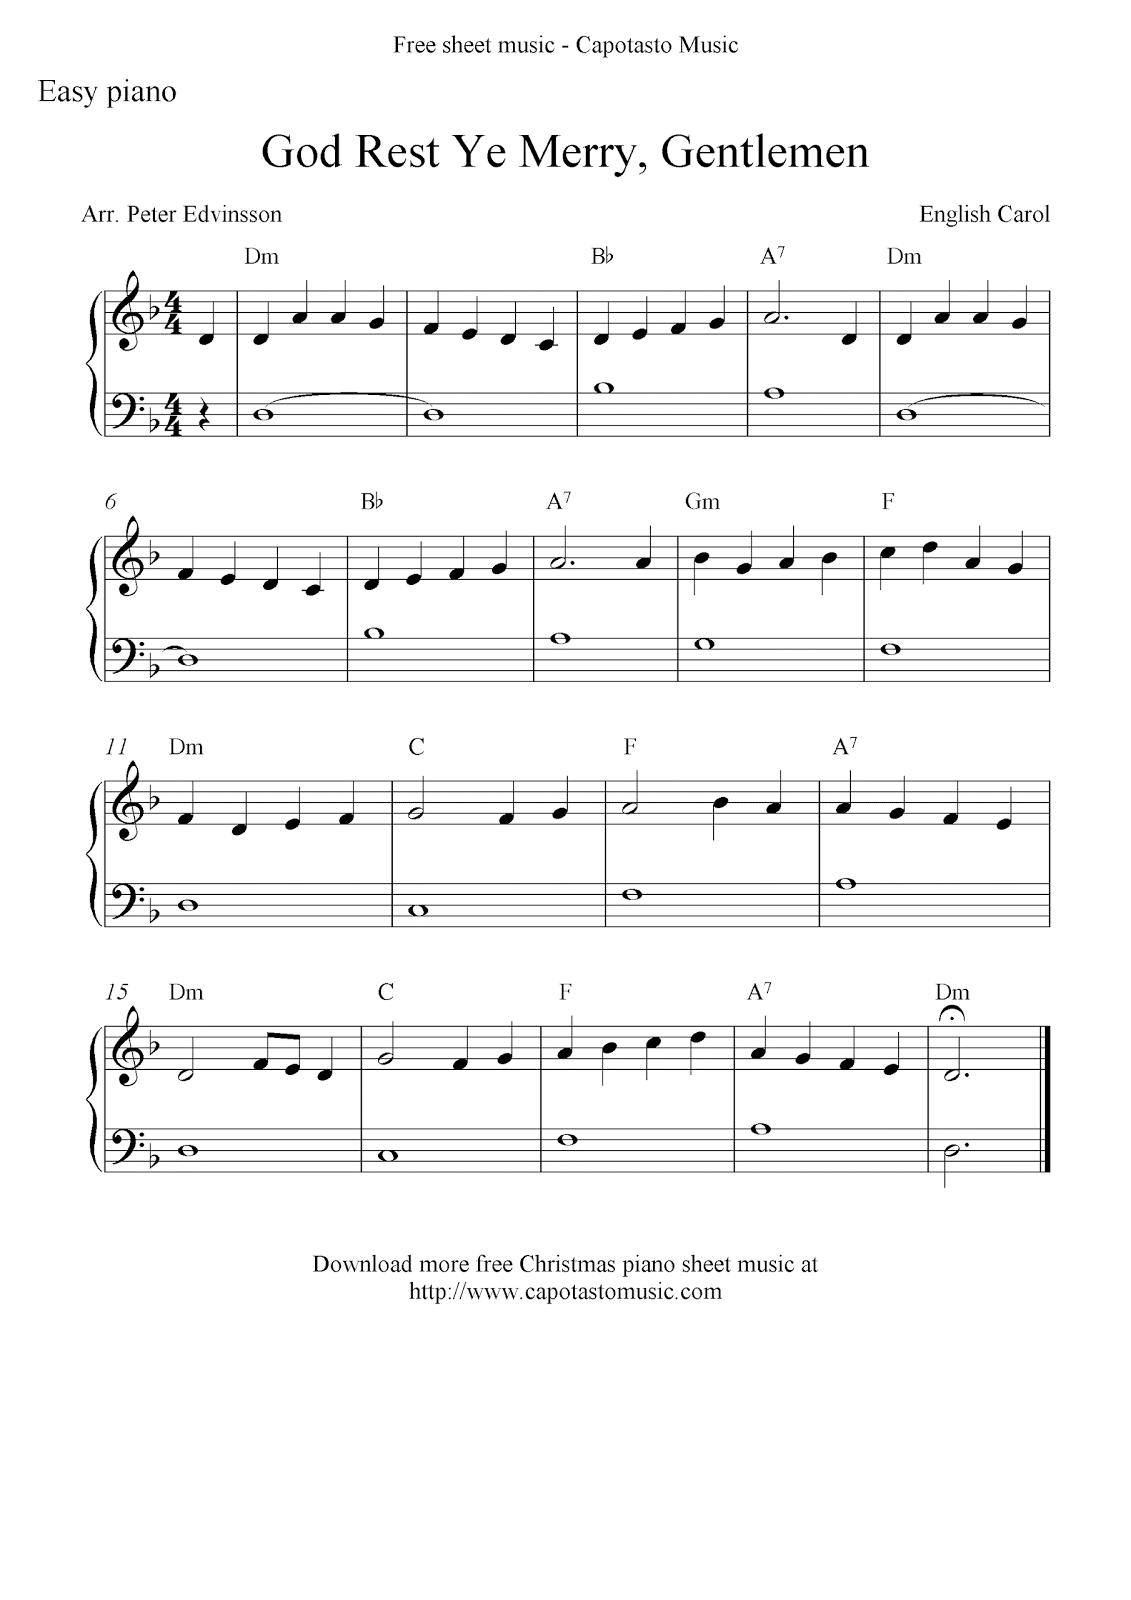 70 Melodious Christmas Piano Sheet Music | Kittybabylove - Christmas Piano Sheet Music Easy Free Printable